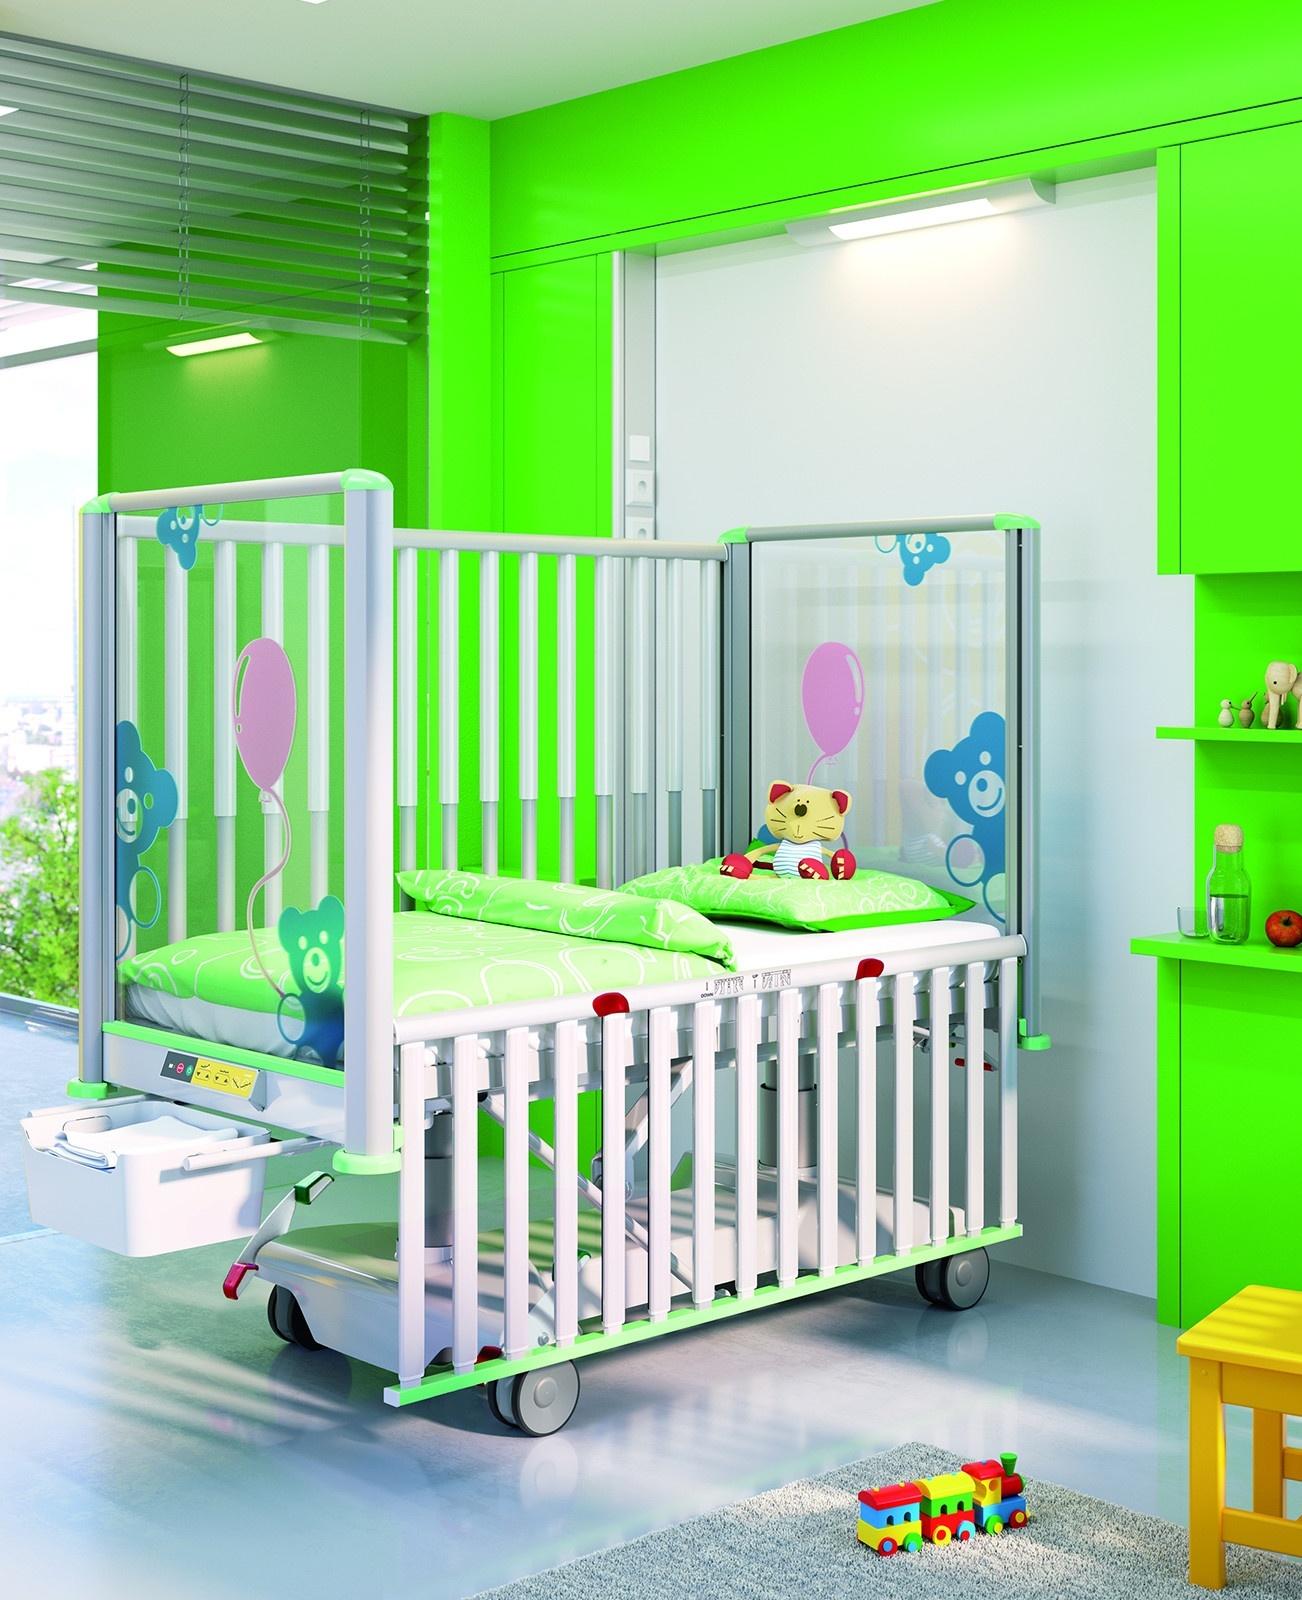 bigla_care_tom2_paediatriebett_spital_2